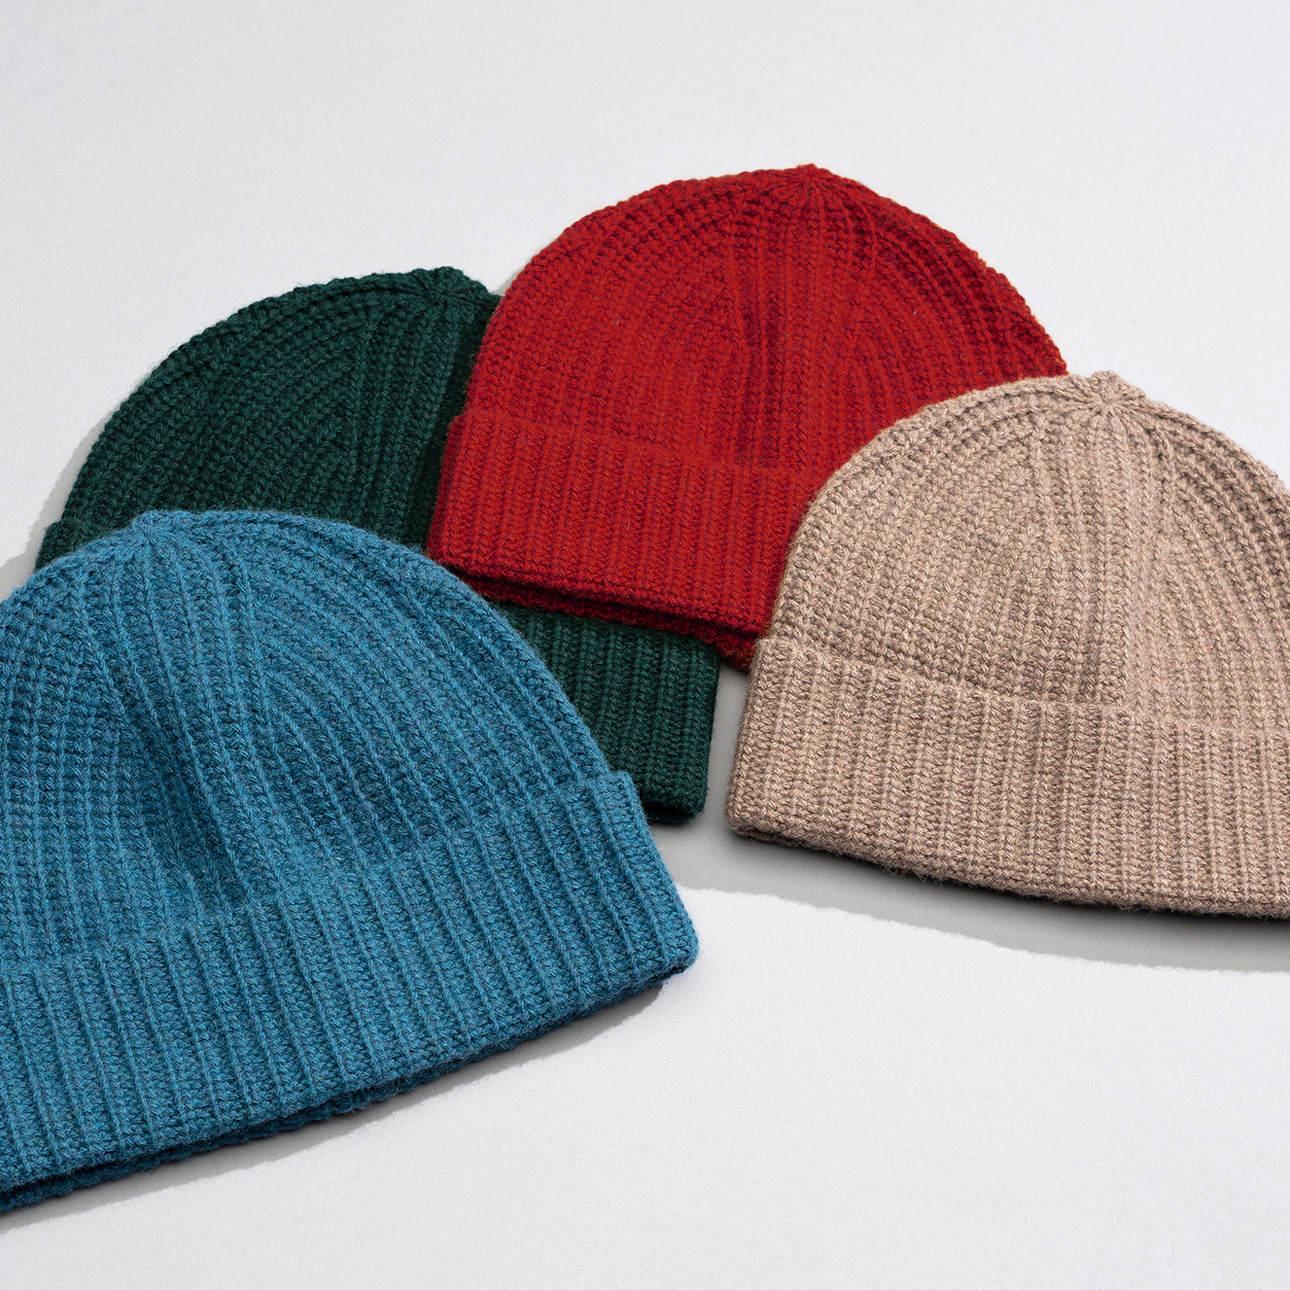 Eton Wool/Cashmere rib knit Beanie